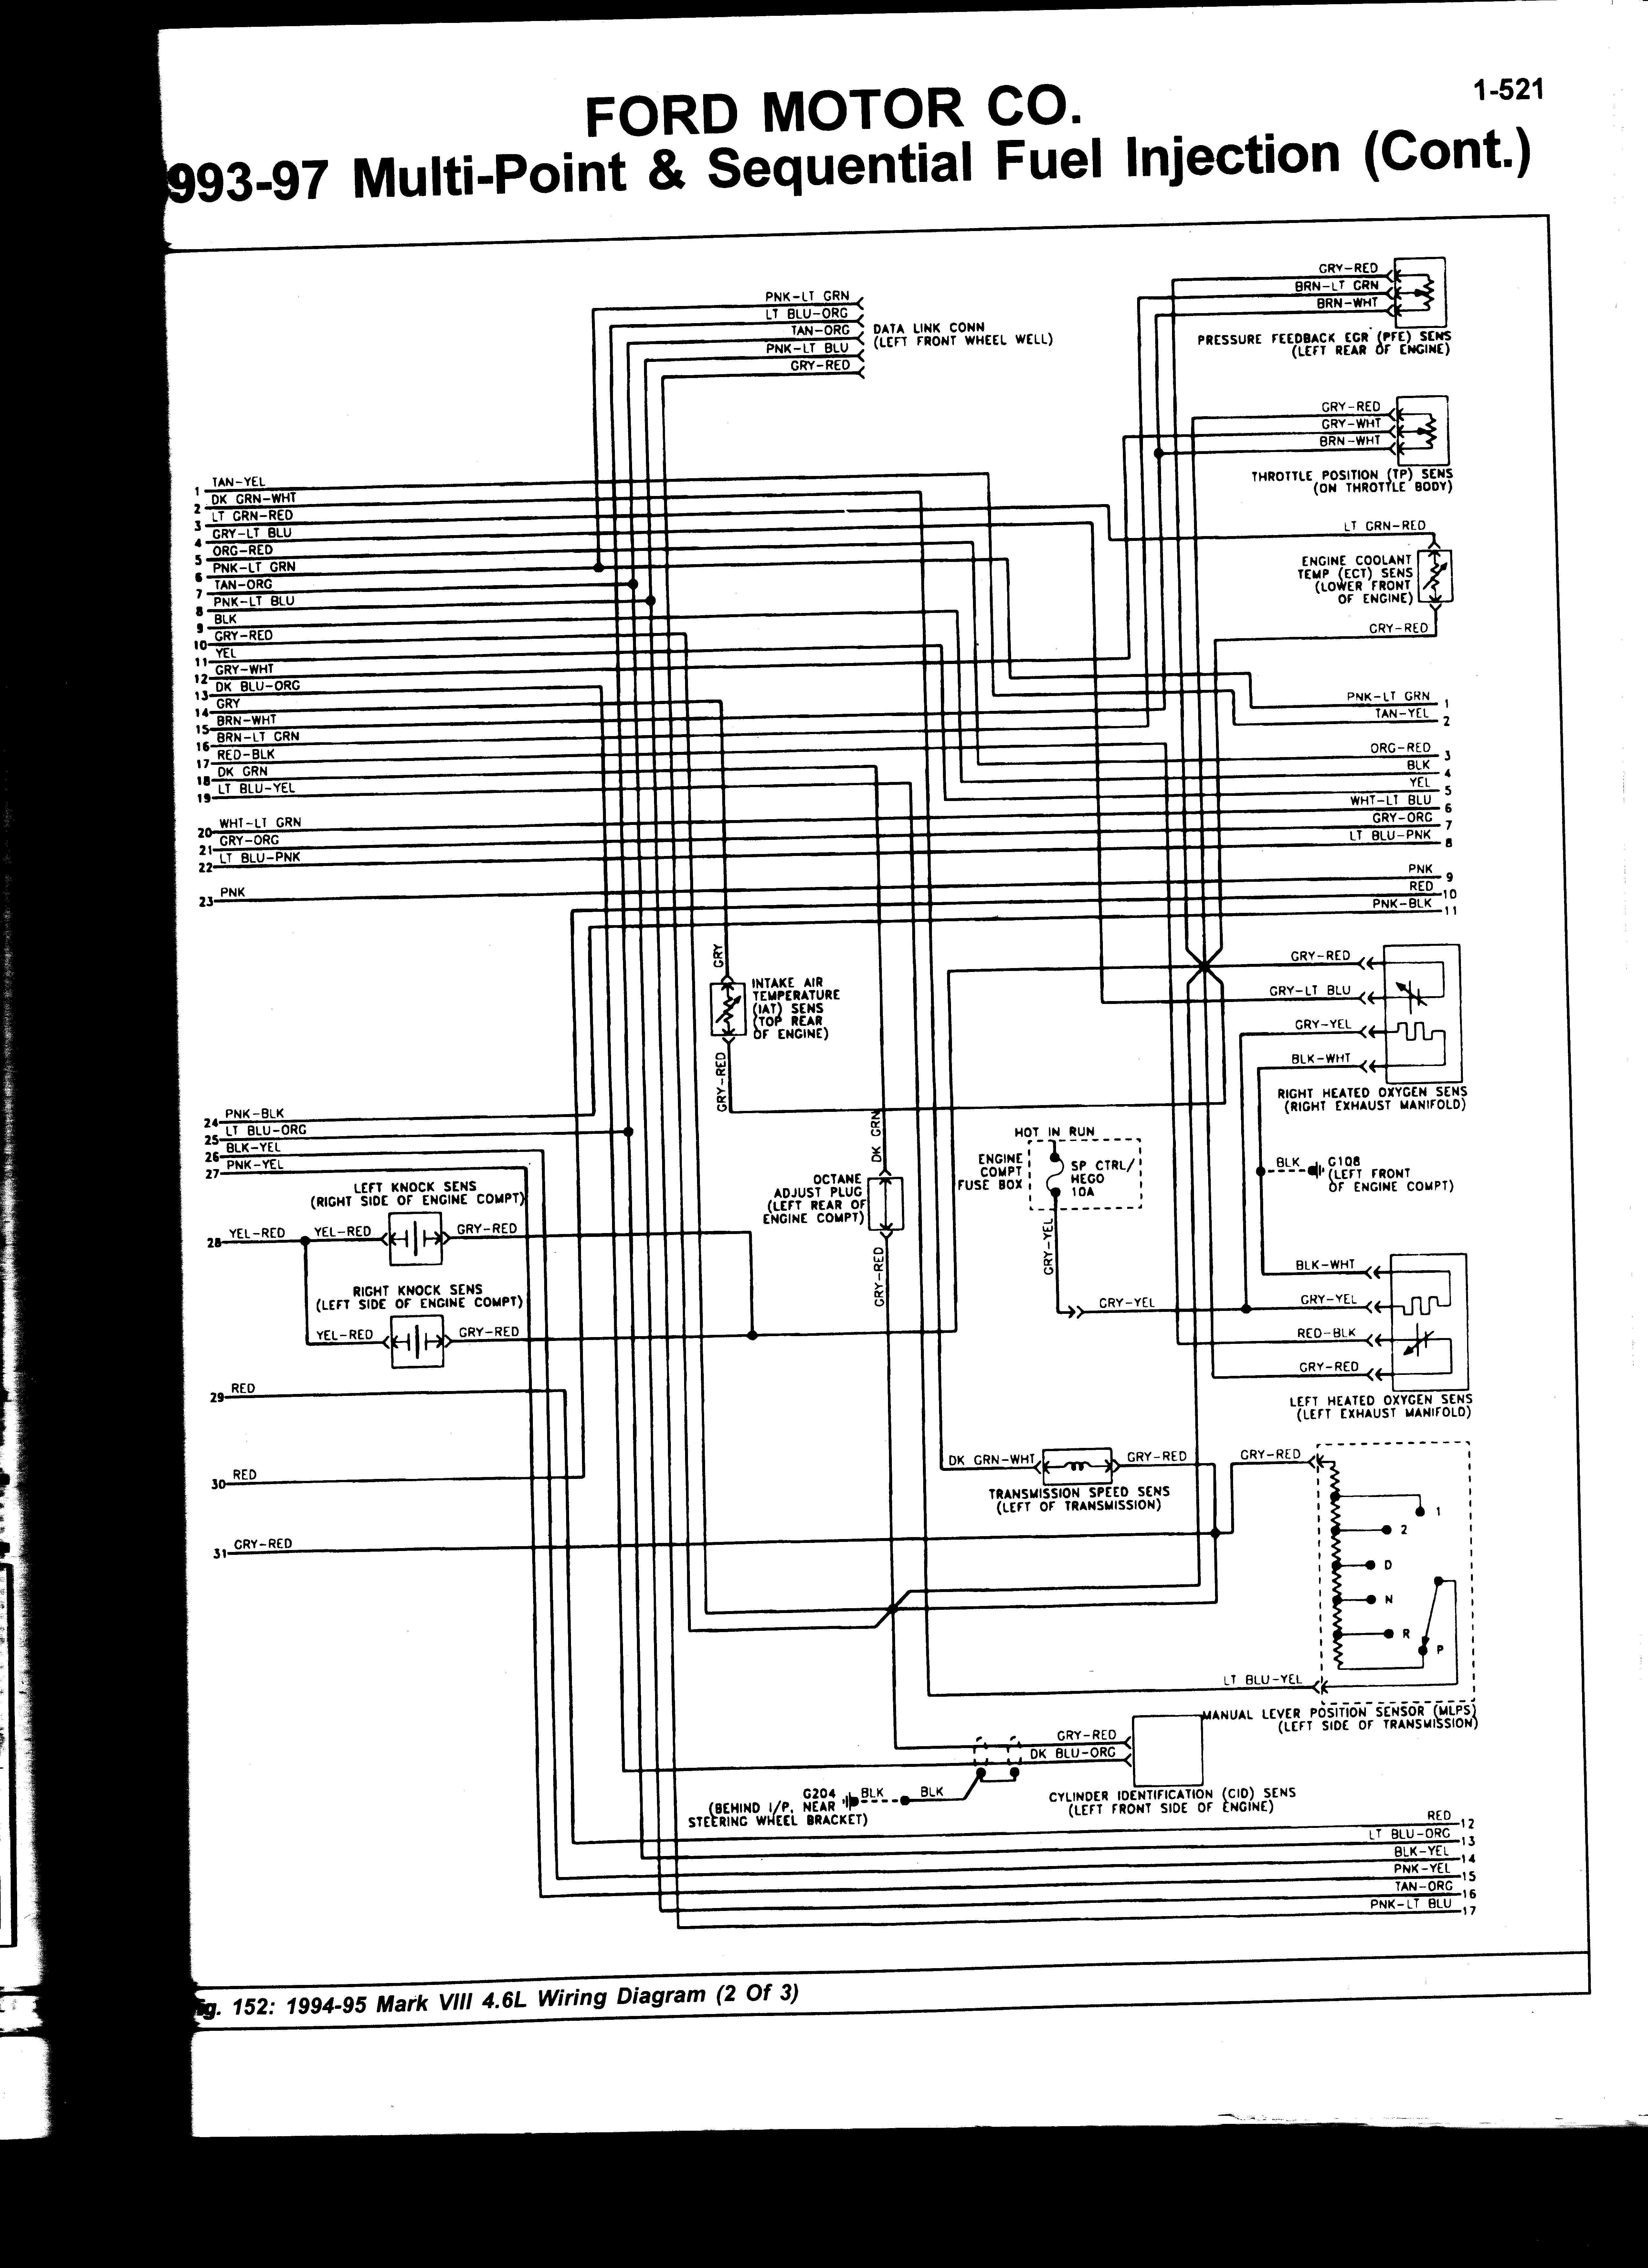 lincoln mark viii fan wiring diagram 4 6 dohc wiring harness options hot rod forum hotrodders  4 6 dohc wiring harness options hot